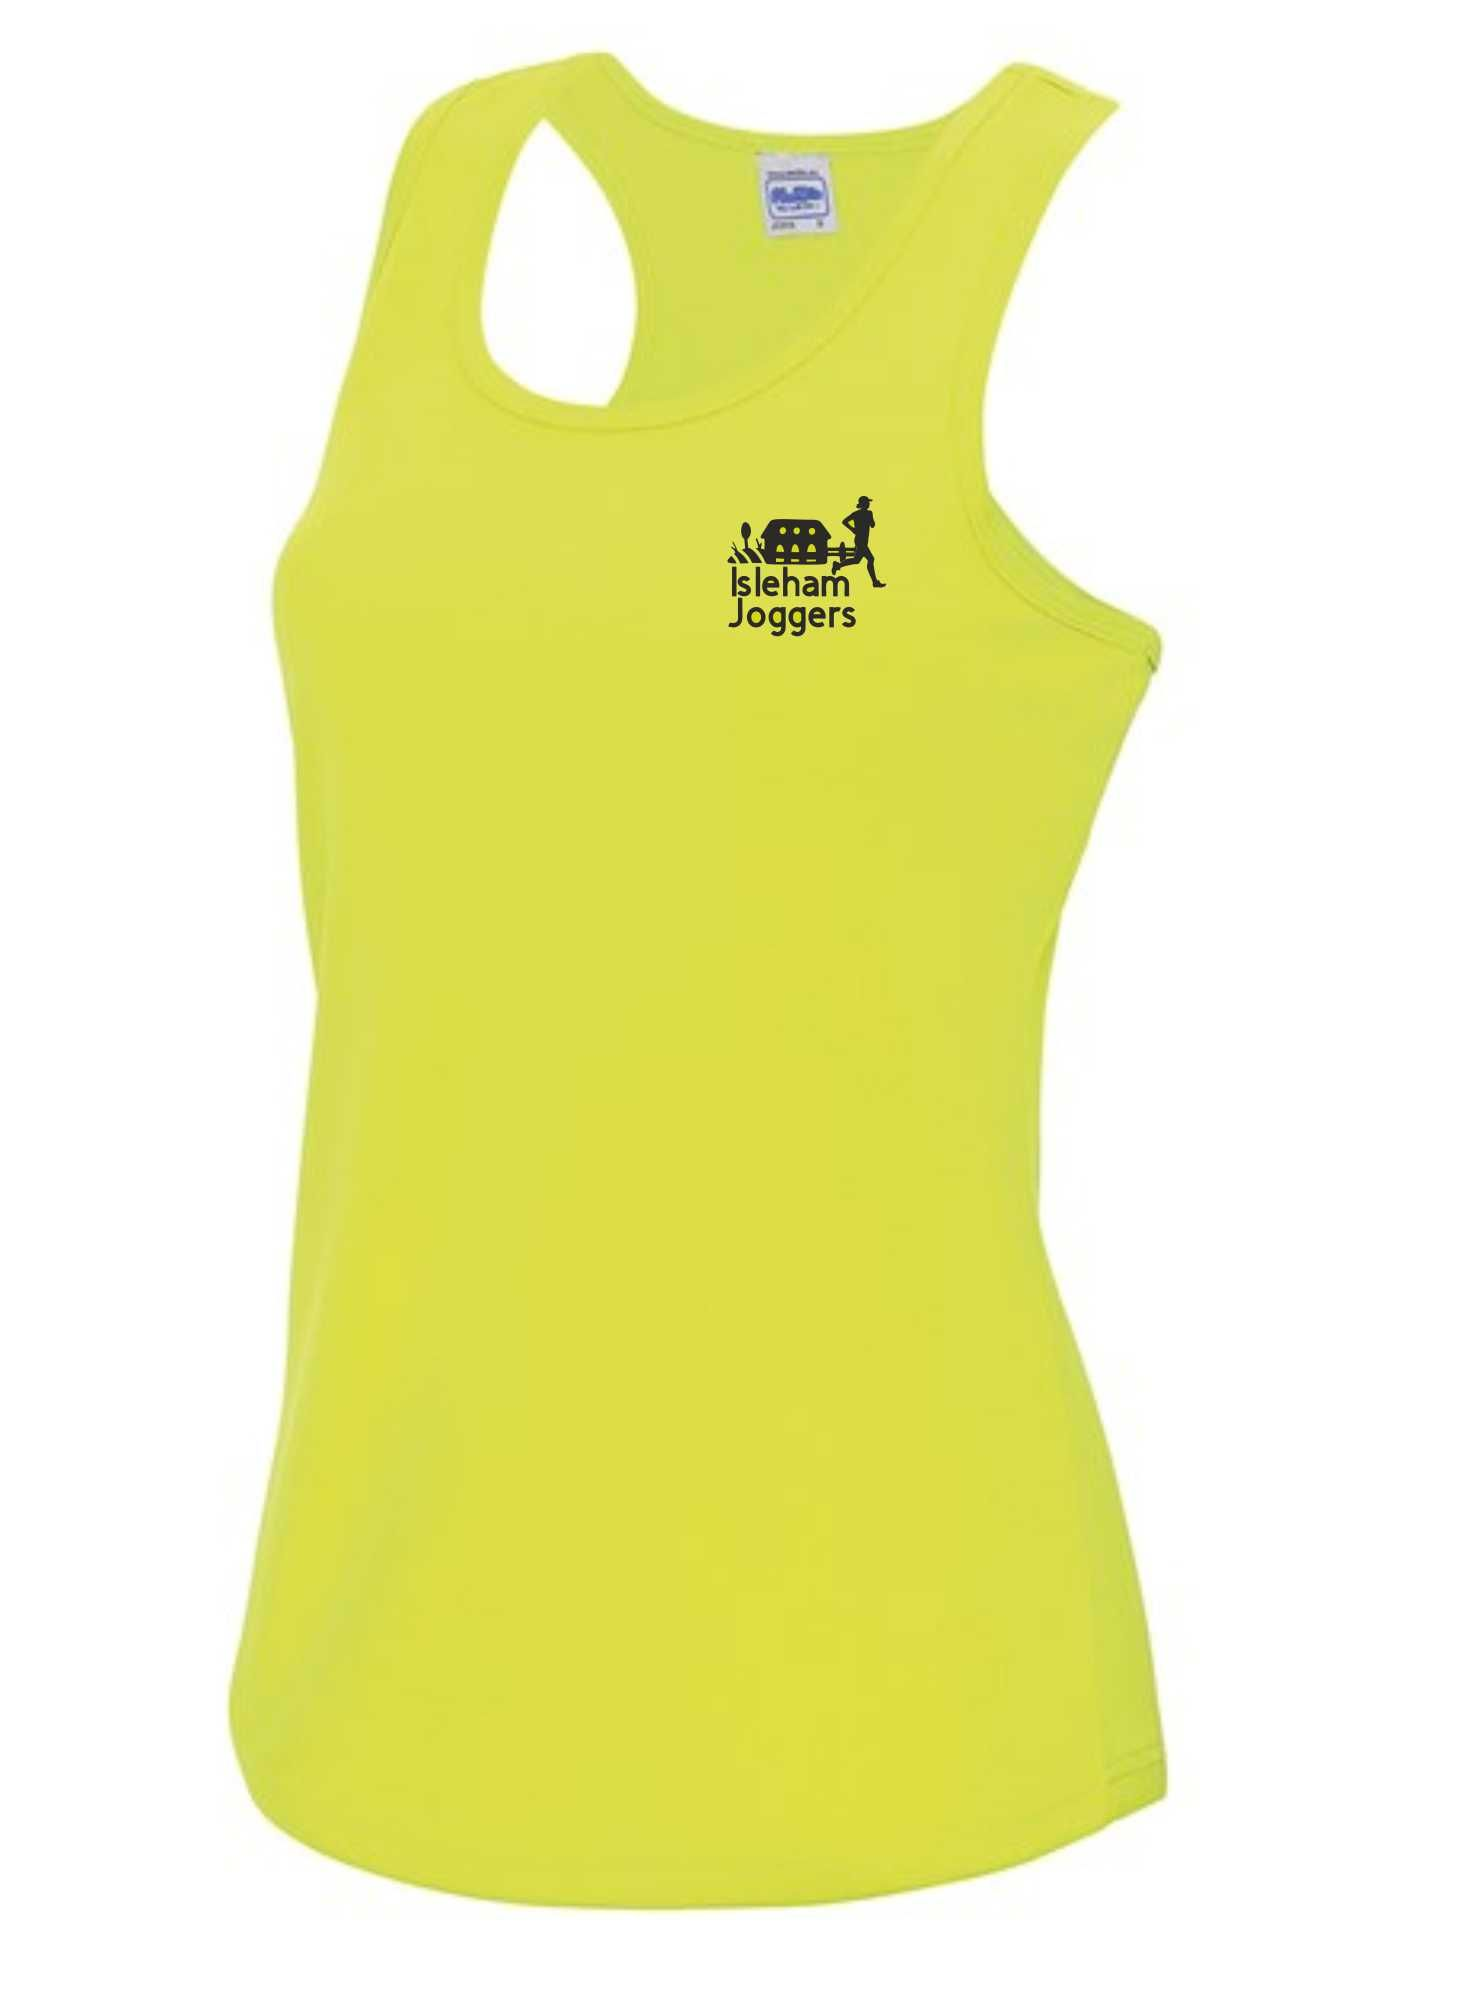 Isleham Joggers- Ladies Vest